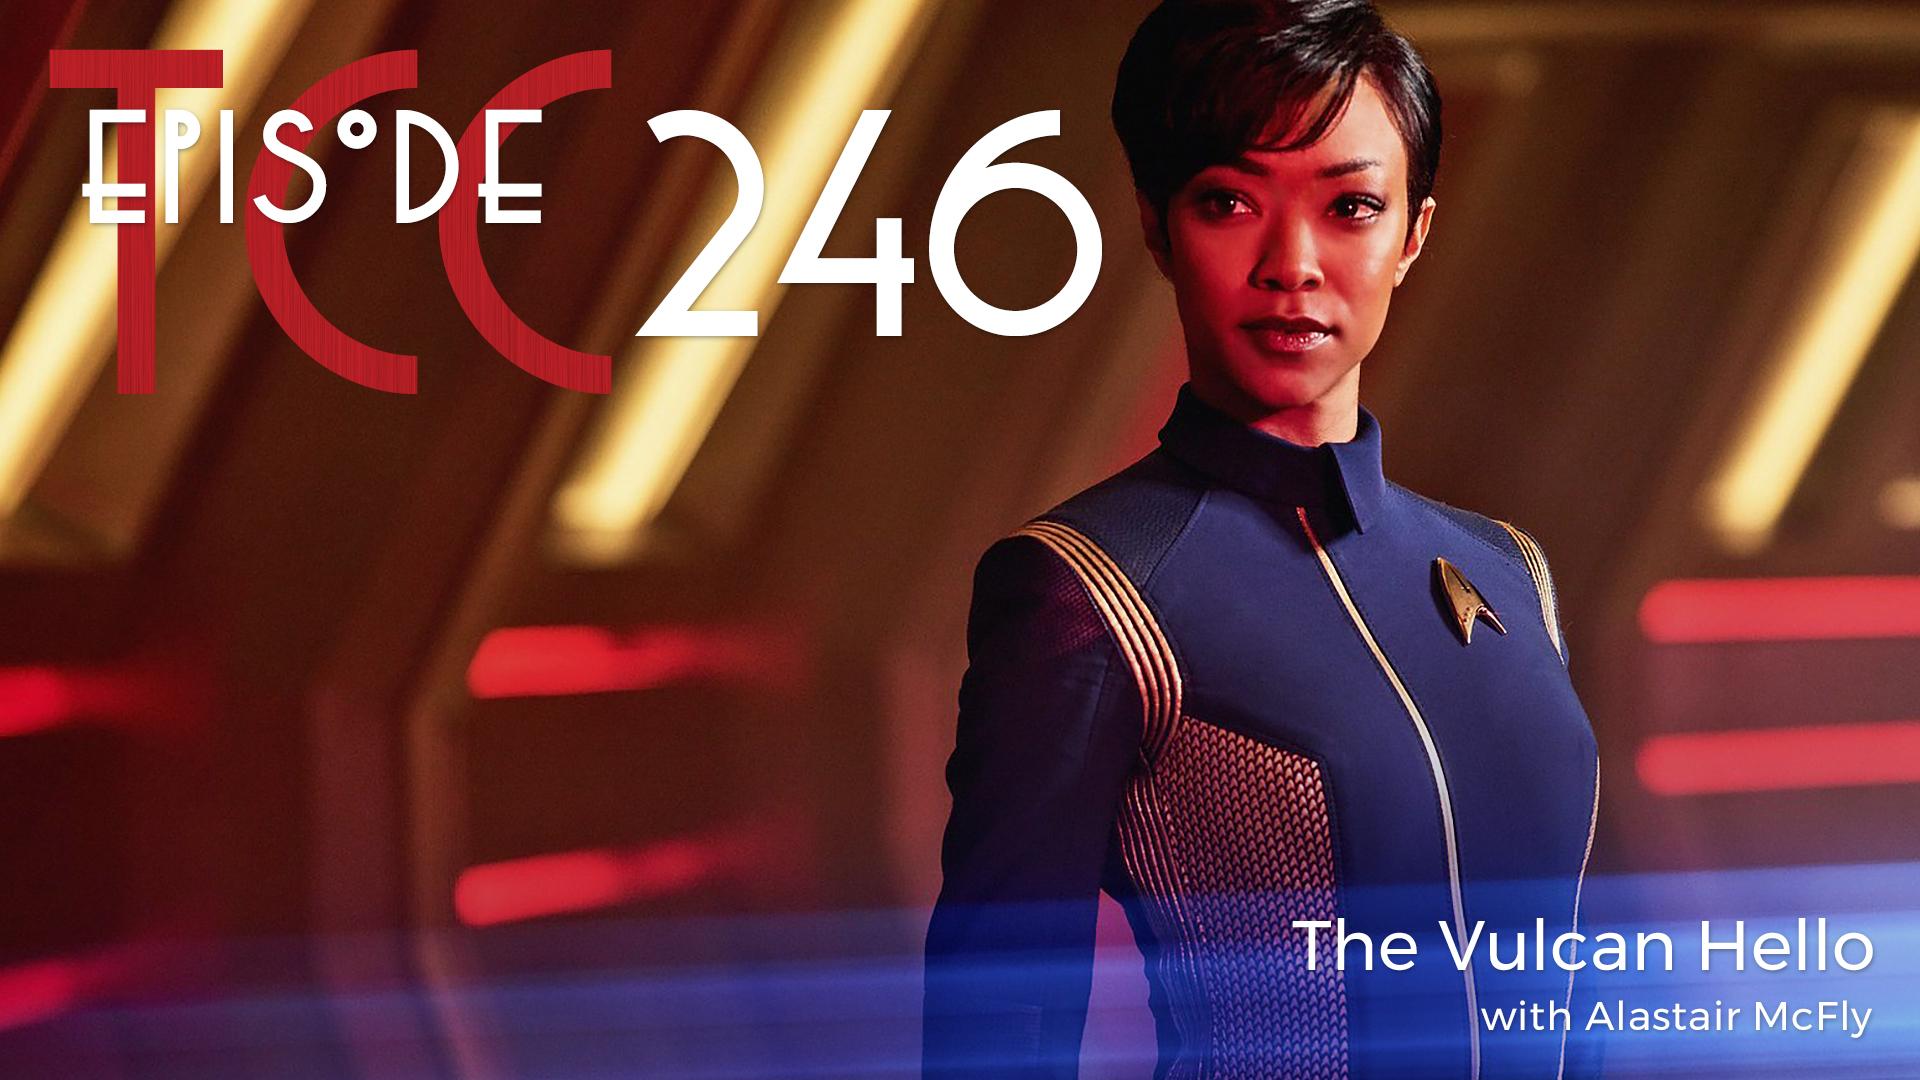 The Citadel Cafe 246: The Vulcan Hello